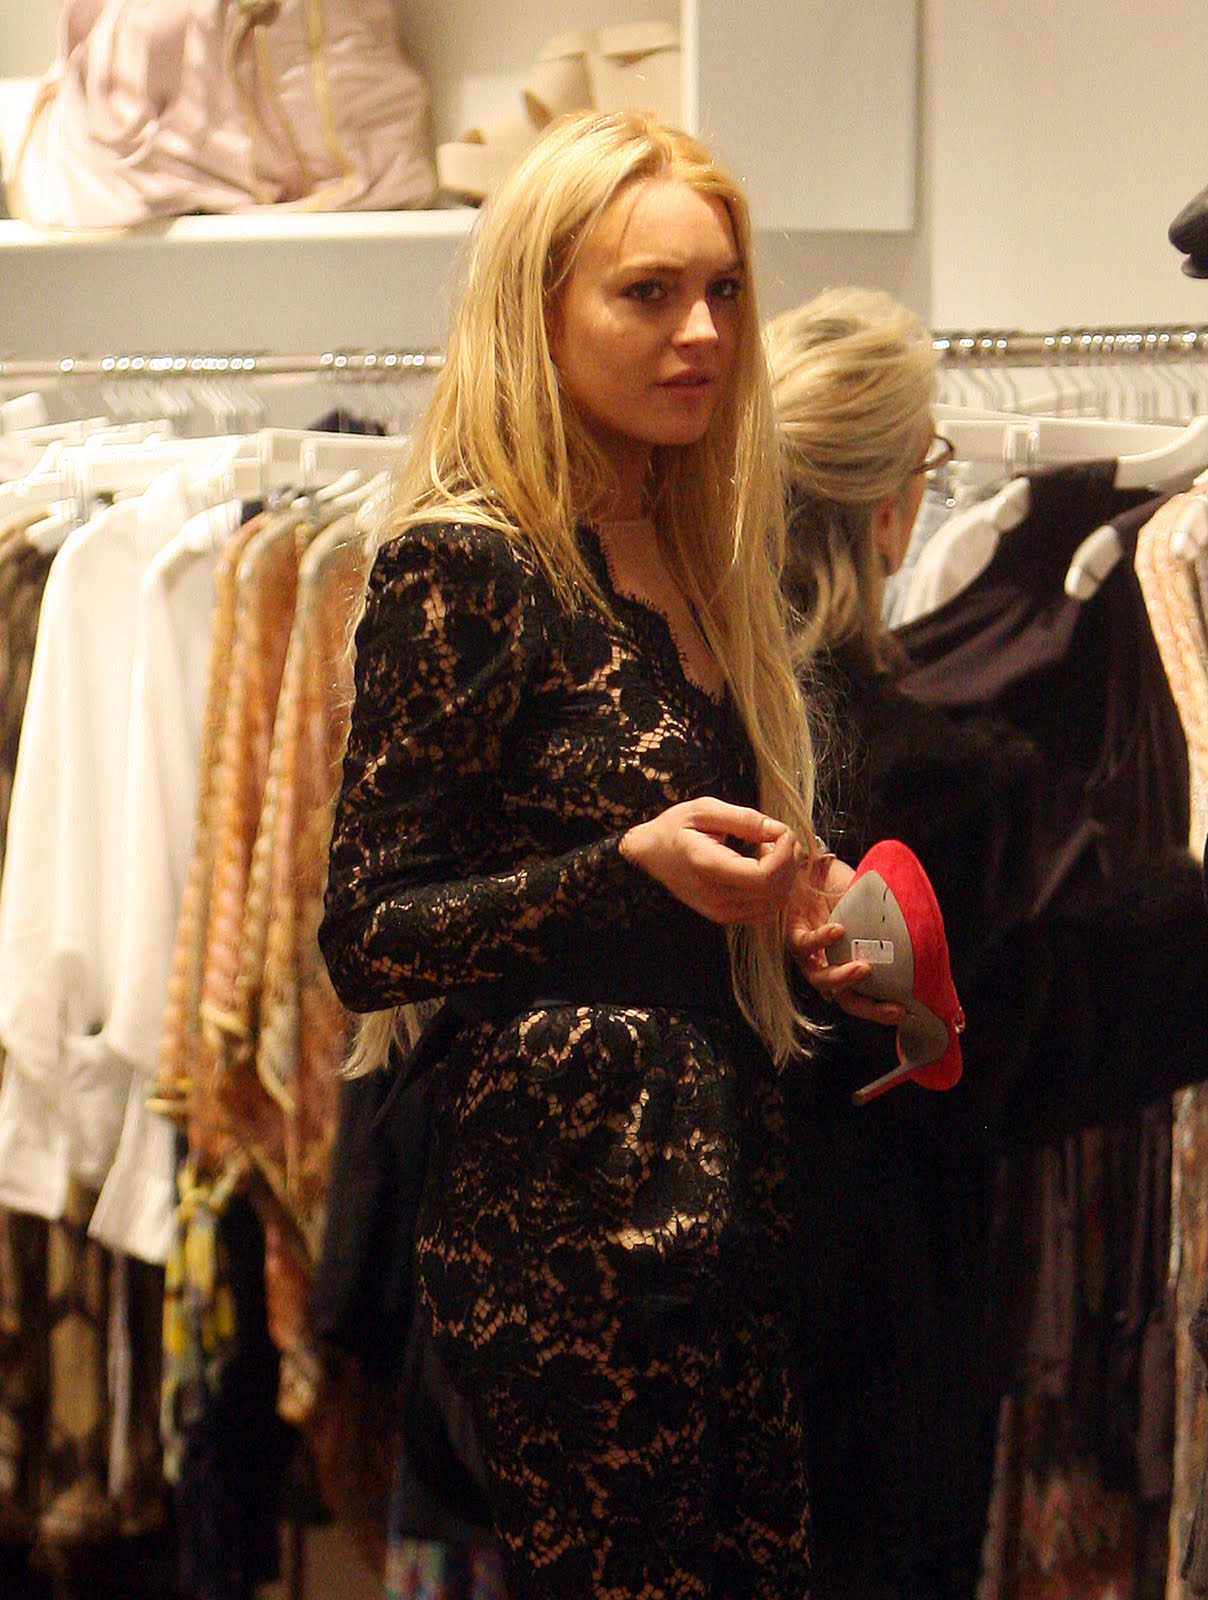 [11598_Preppie_-_Lindsay_Lohan_shopping_in_Manhattan_-_Dec._27_2009_11_122_484lo.jpg]